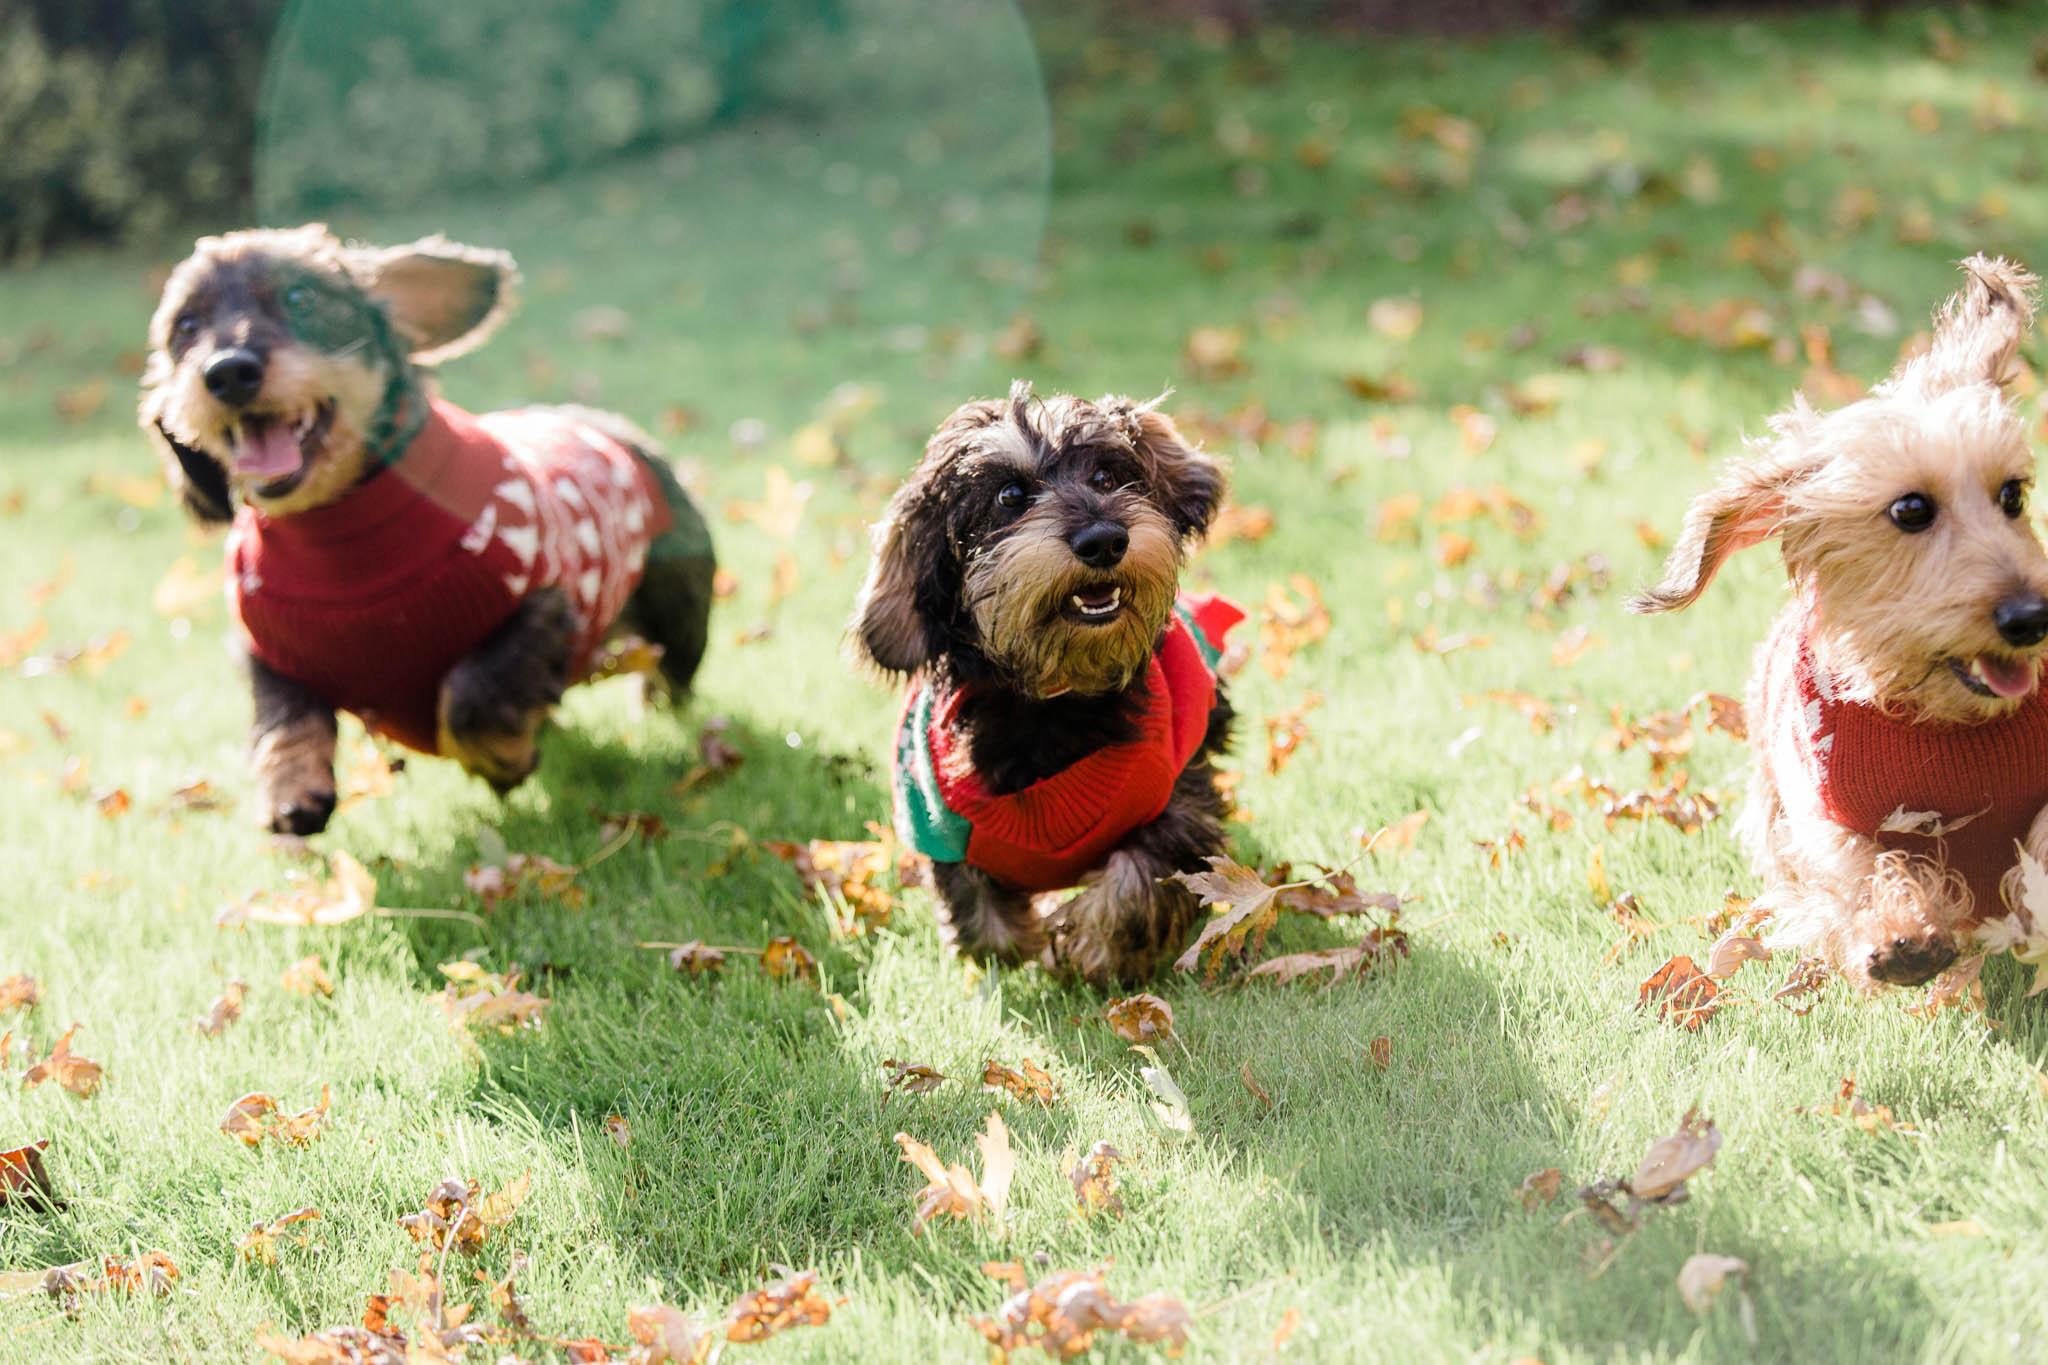 three sausage dogs running - dog photography